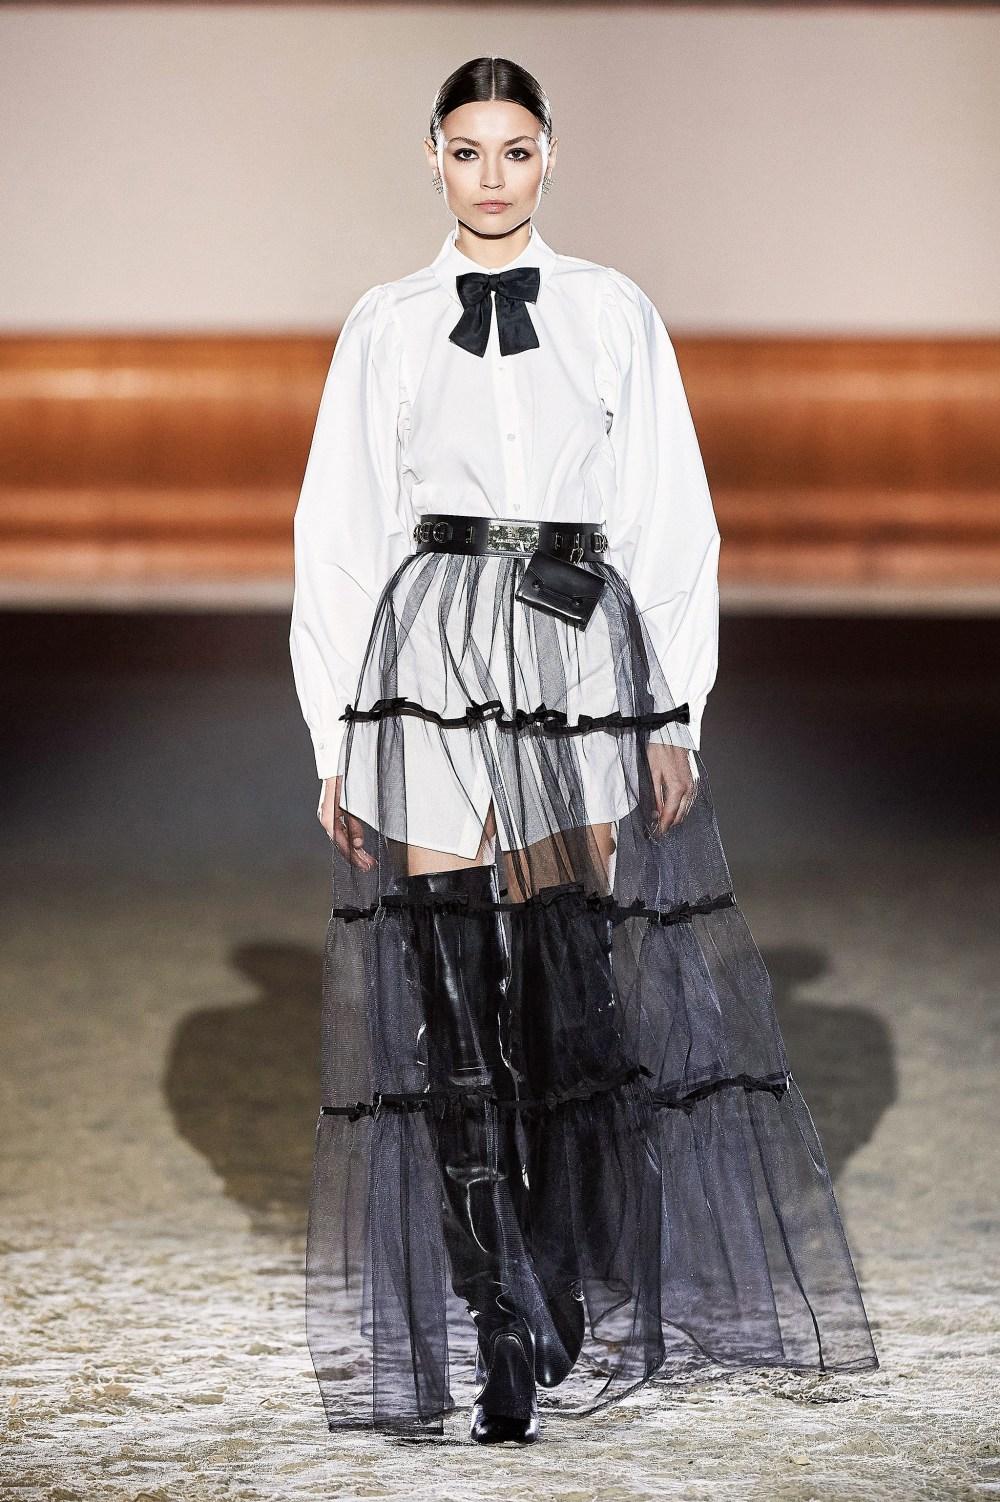 Elisabetta Franchi: Elisabetta Franchi Fall Winter 2021-22 Fashion Show Photo #56